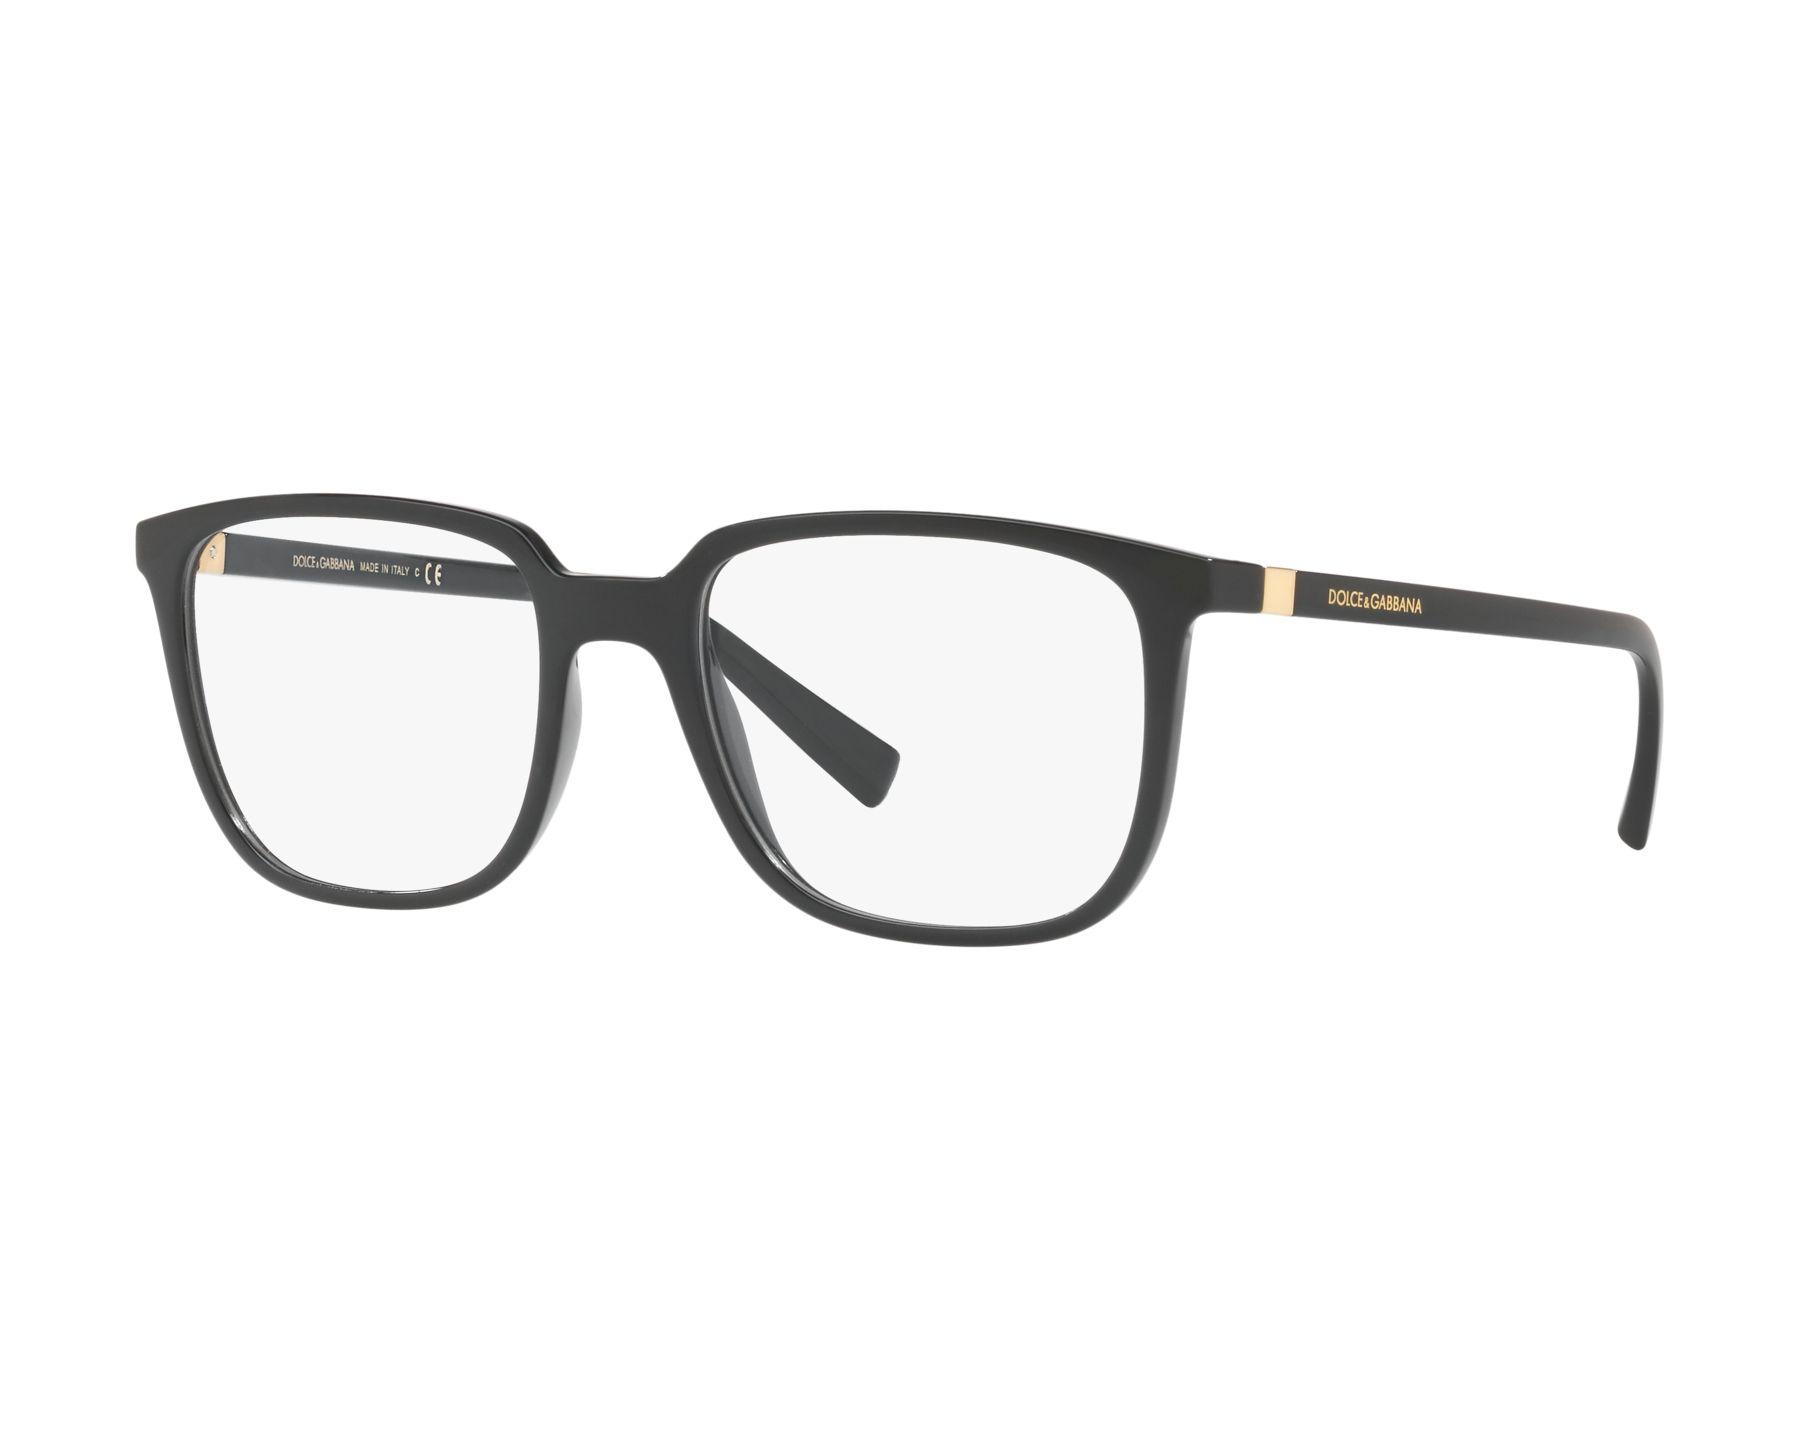 8e8eb2a406e eyeglasses Dolce   Gabbana DG-5029 501 54-18 Black Gold